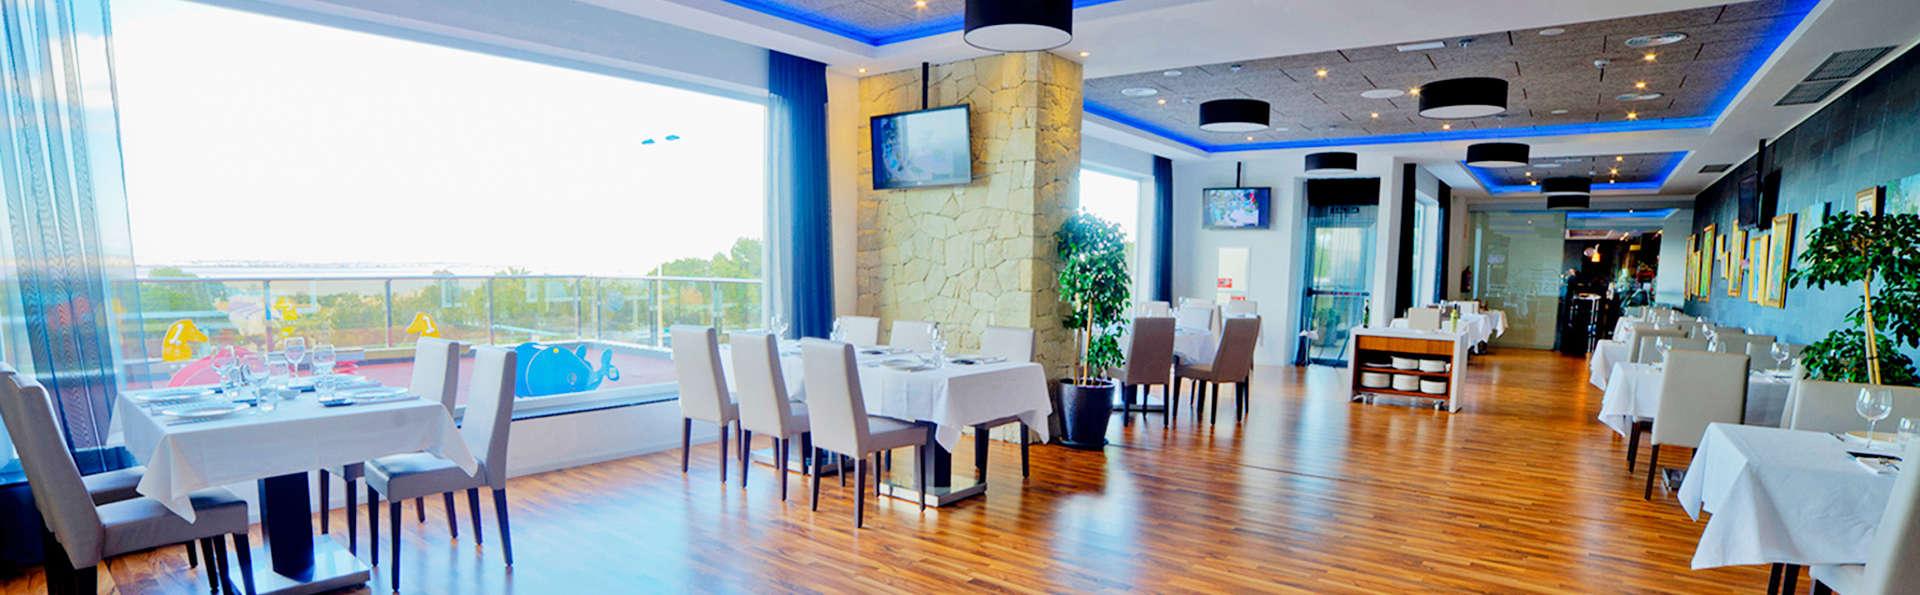 Hotel Doña Monse - EDIT_NEW_restaurant.jpg